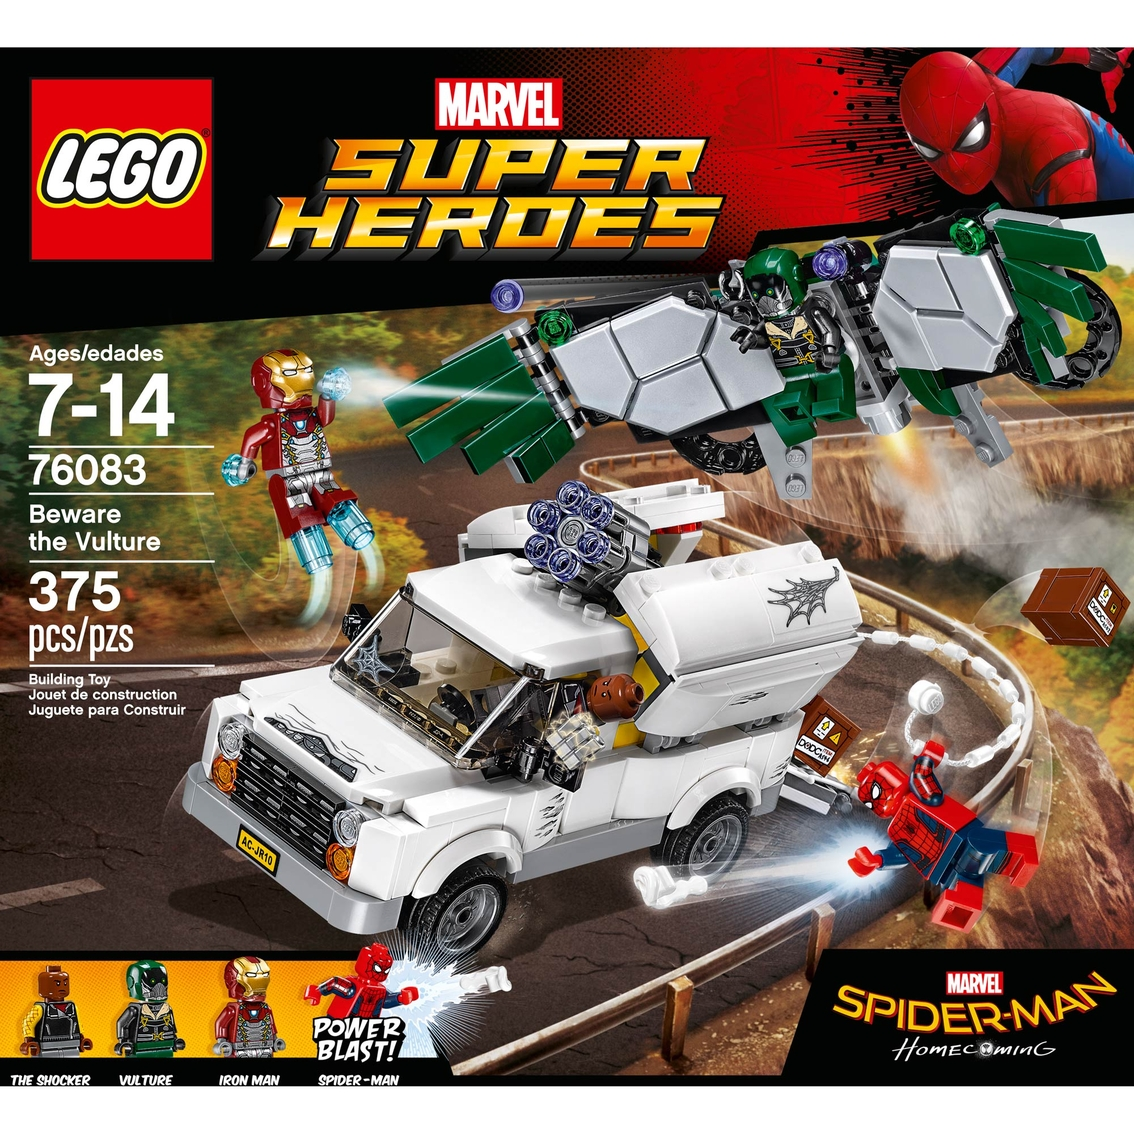 Lego Marvel Super Heroes Beware The Vulture Lego Marvel Super